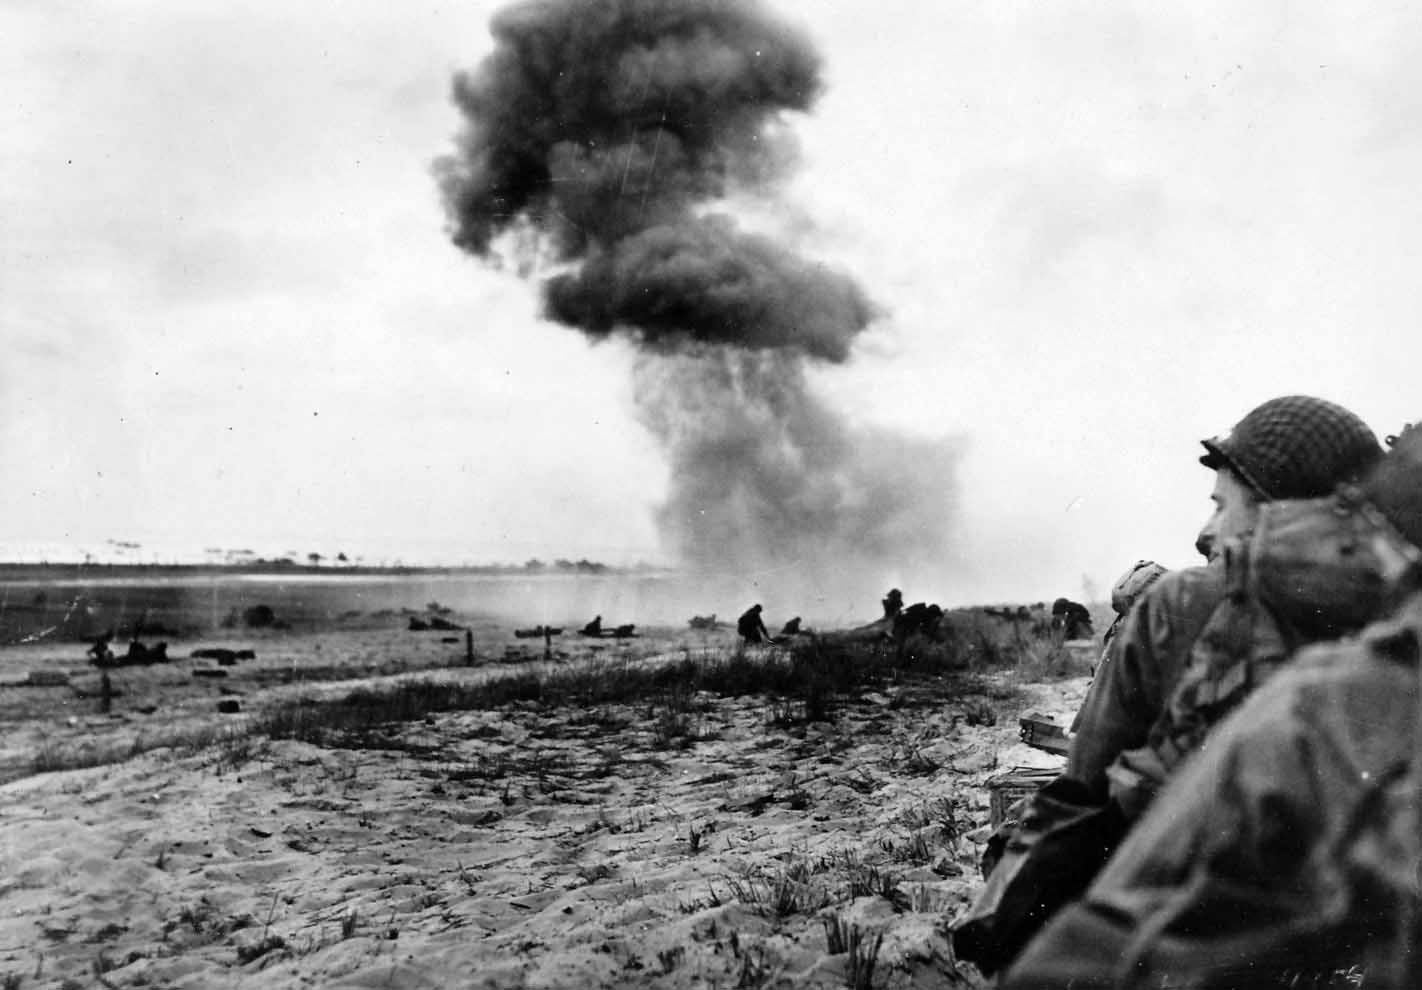 German 88 mm guns pound GIs on beach